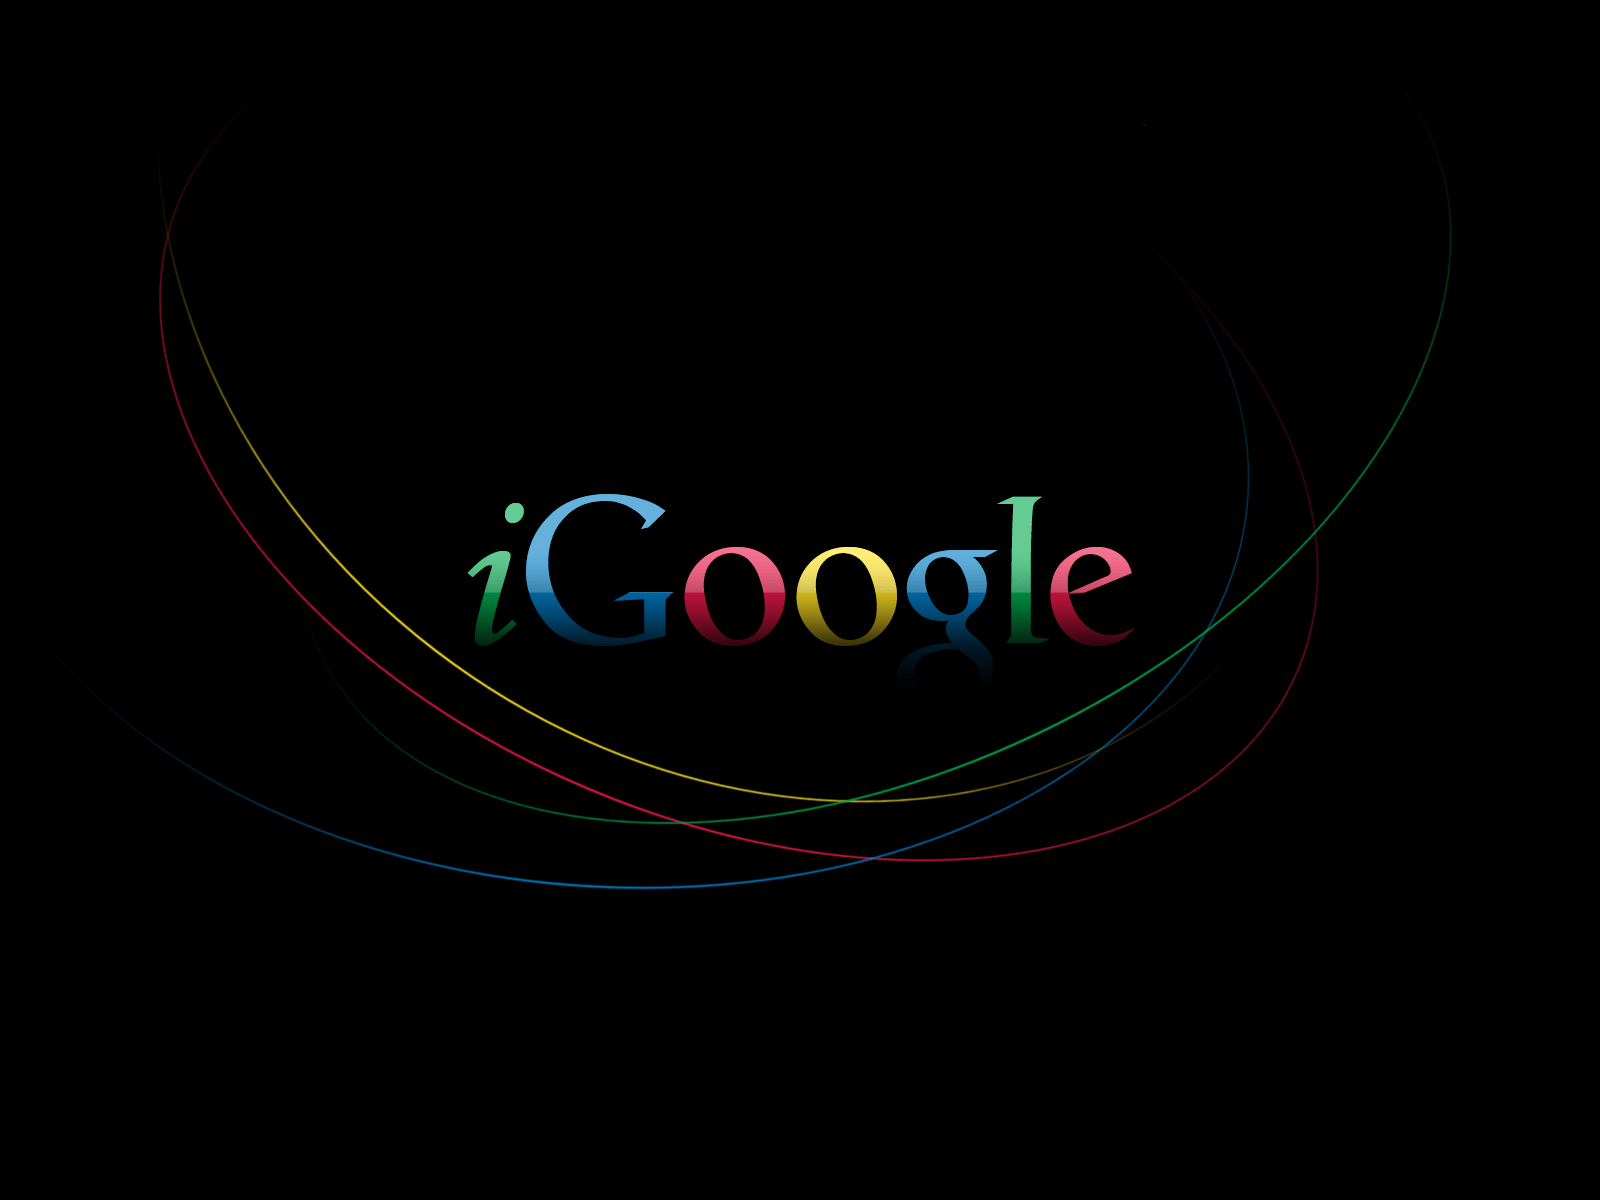 how to get google photos